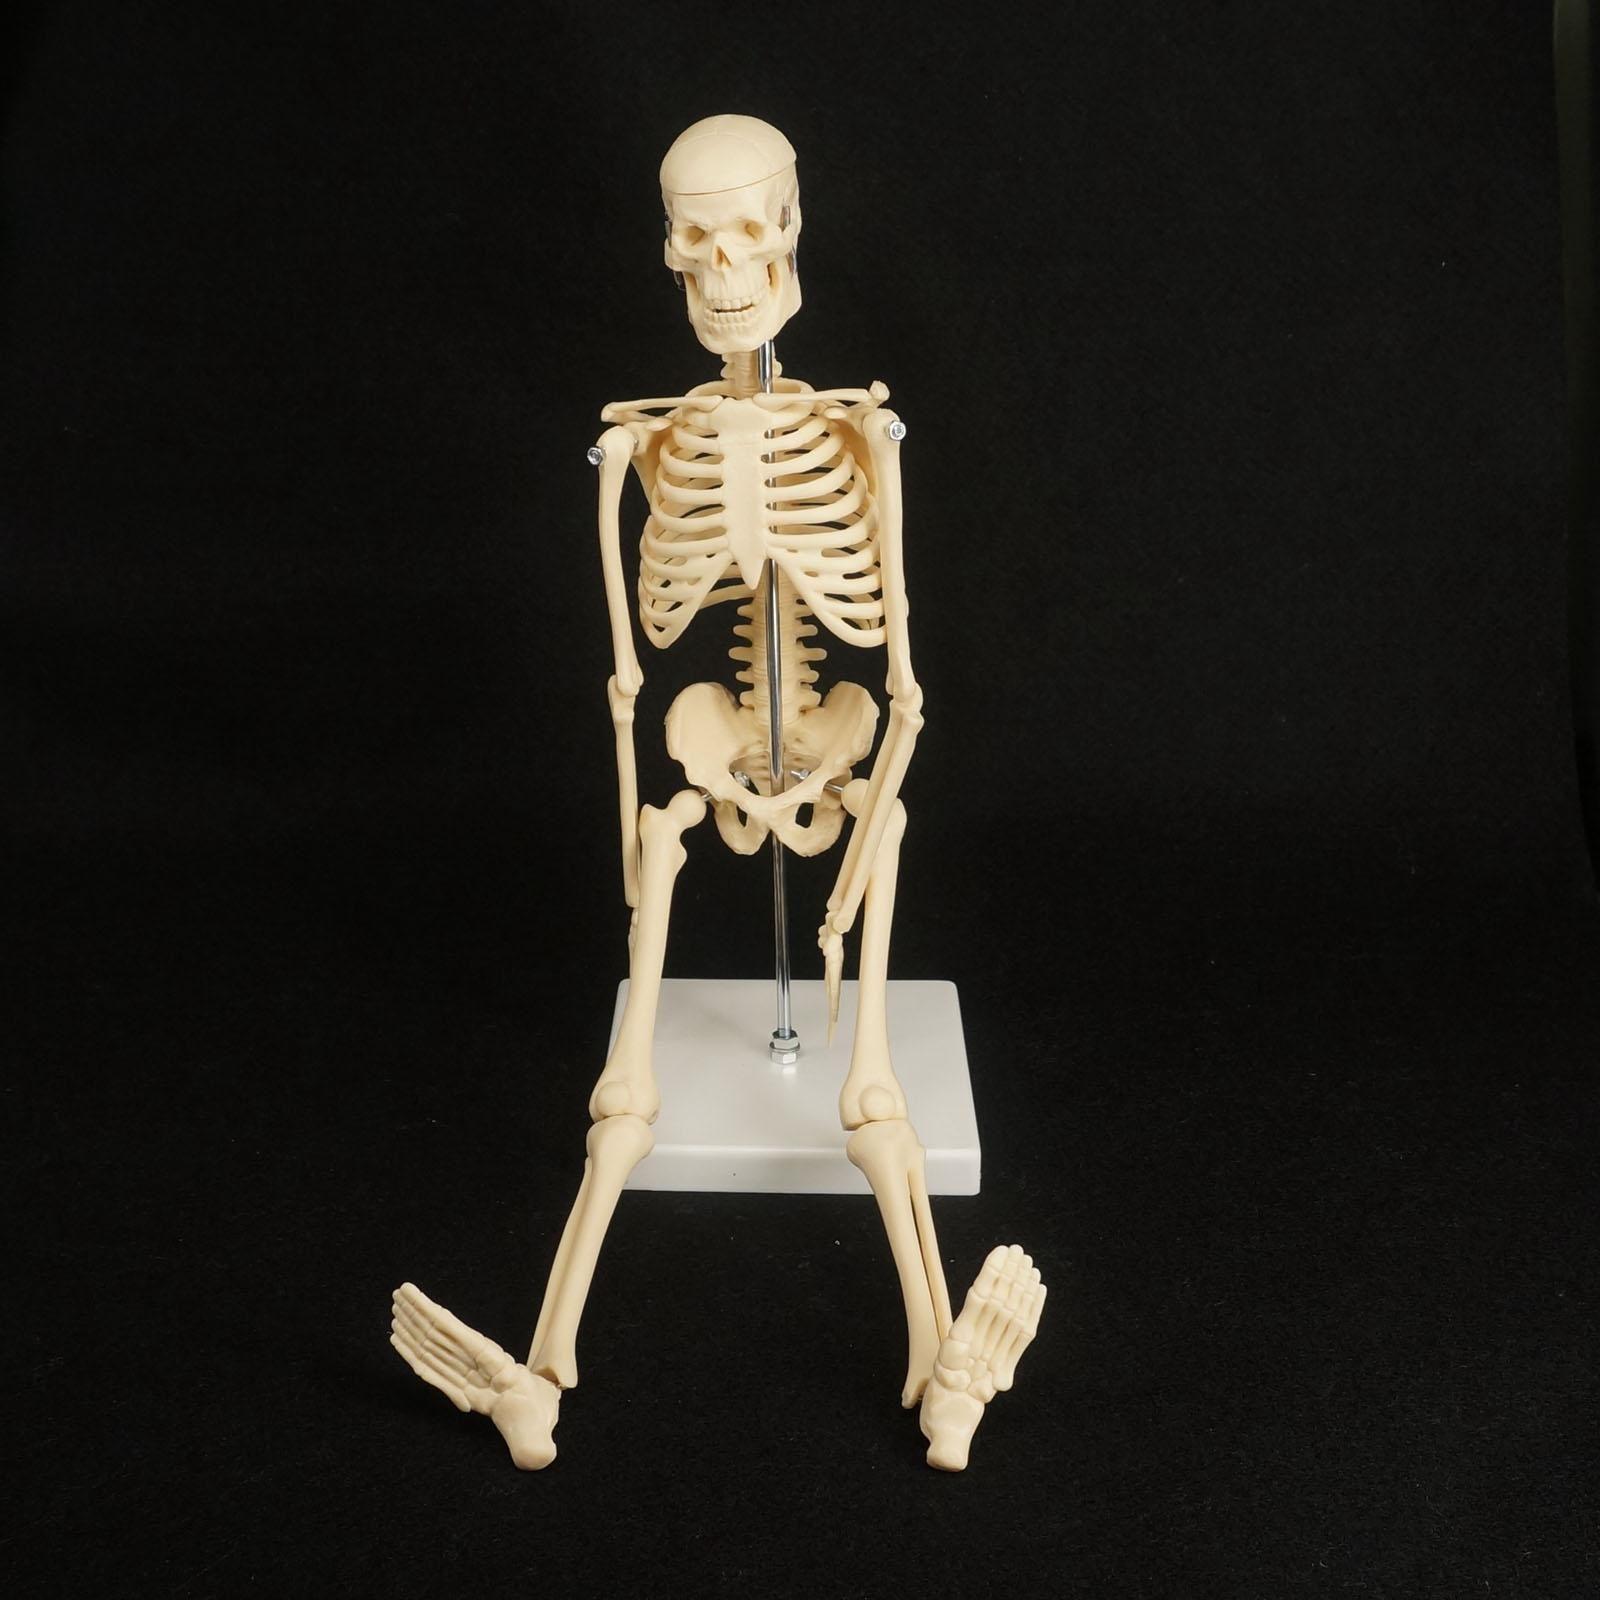 Comprar 45 CM Corpo Mini Modelo Humano Modelo de Esqueleto Anatômico ...